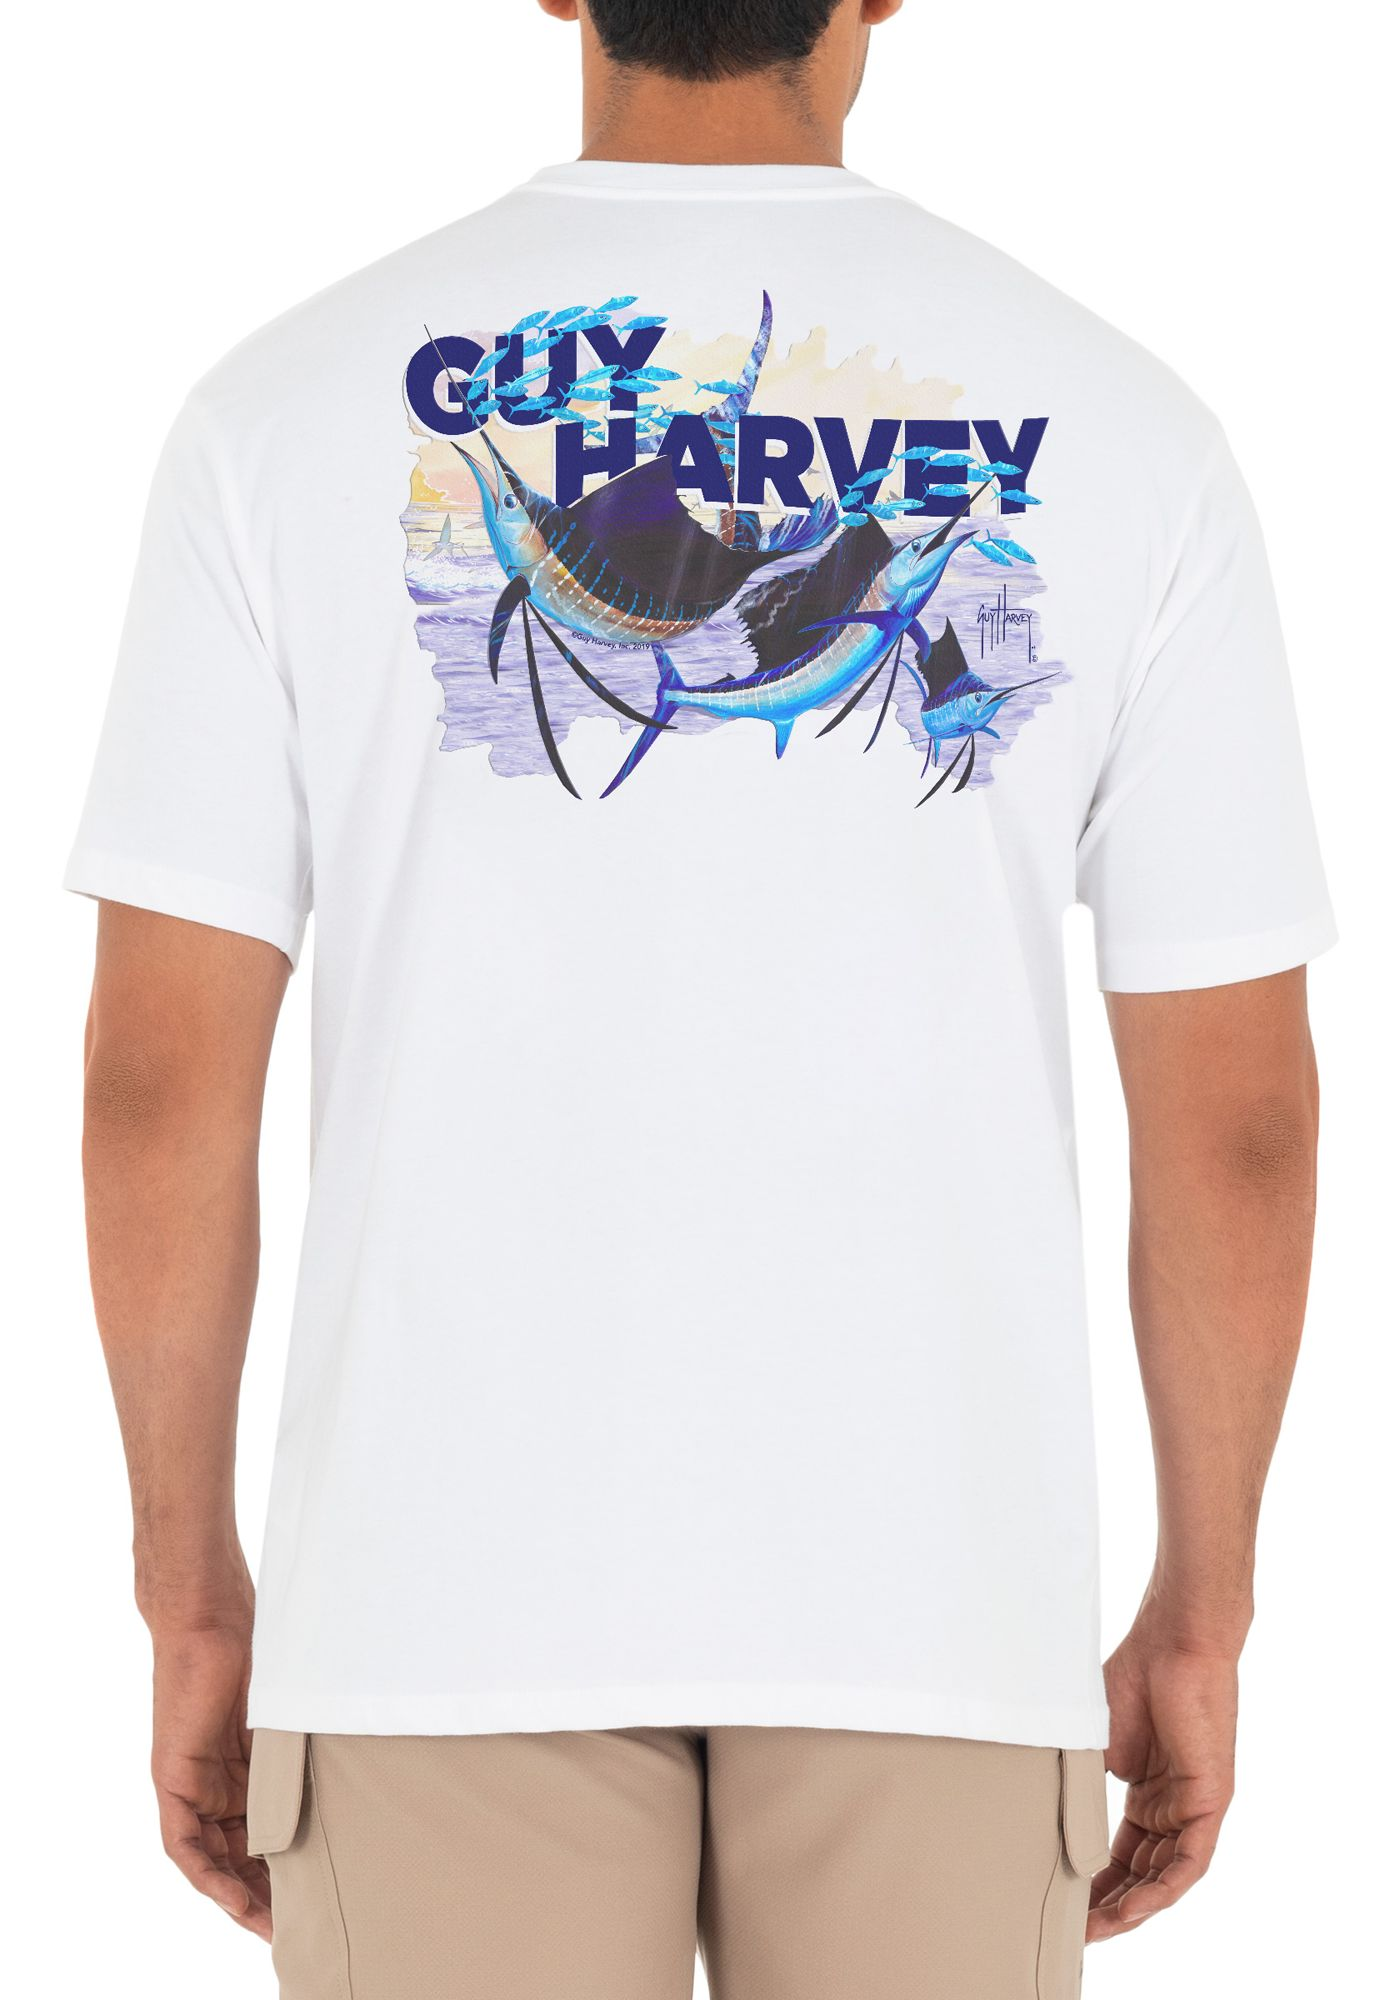 Guy Harvey Men's Offshore Haul Sailfish Short Sleeve T-Shirt